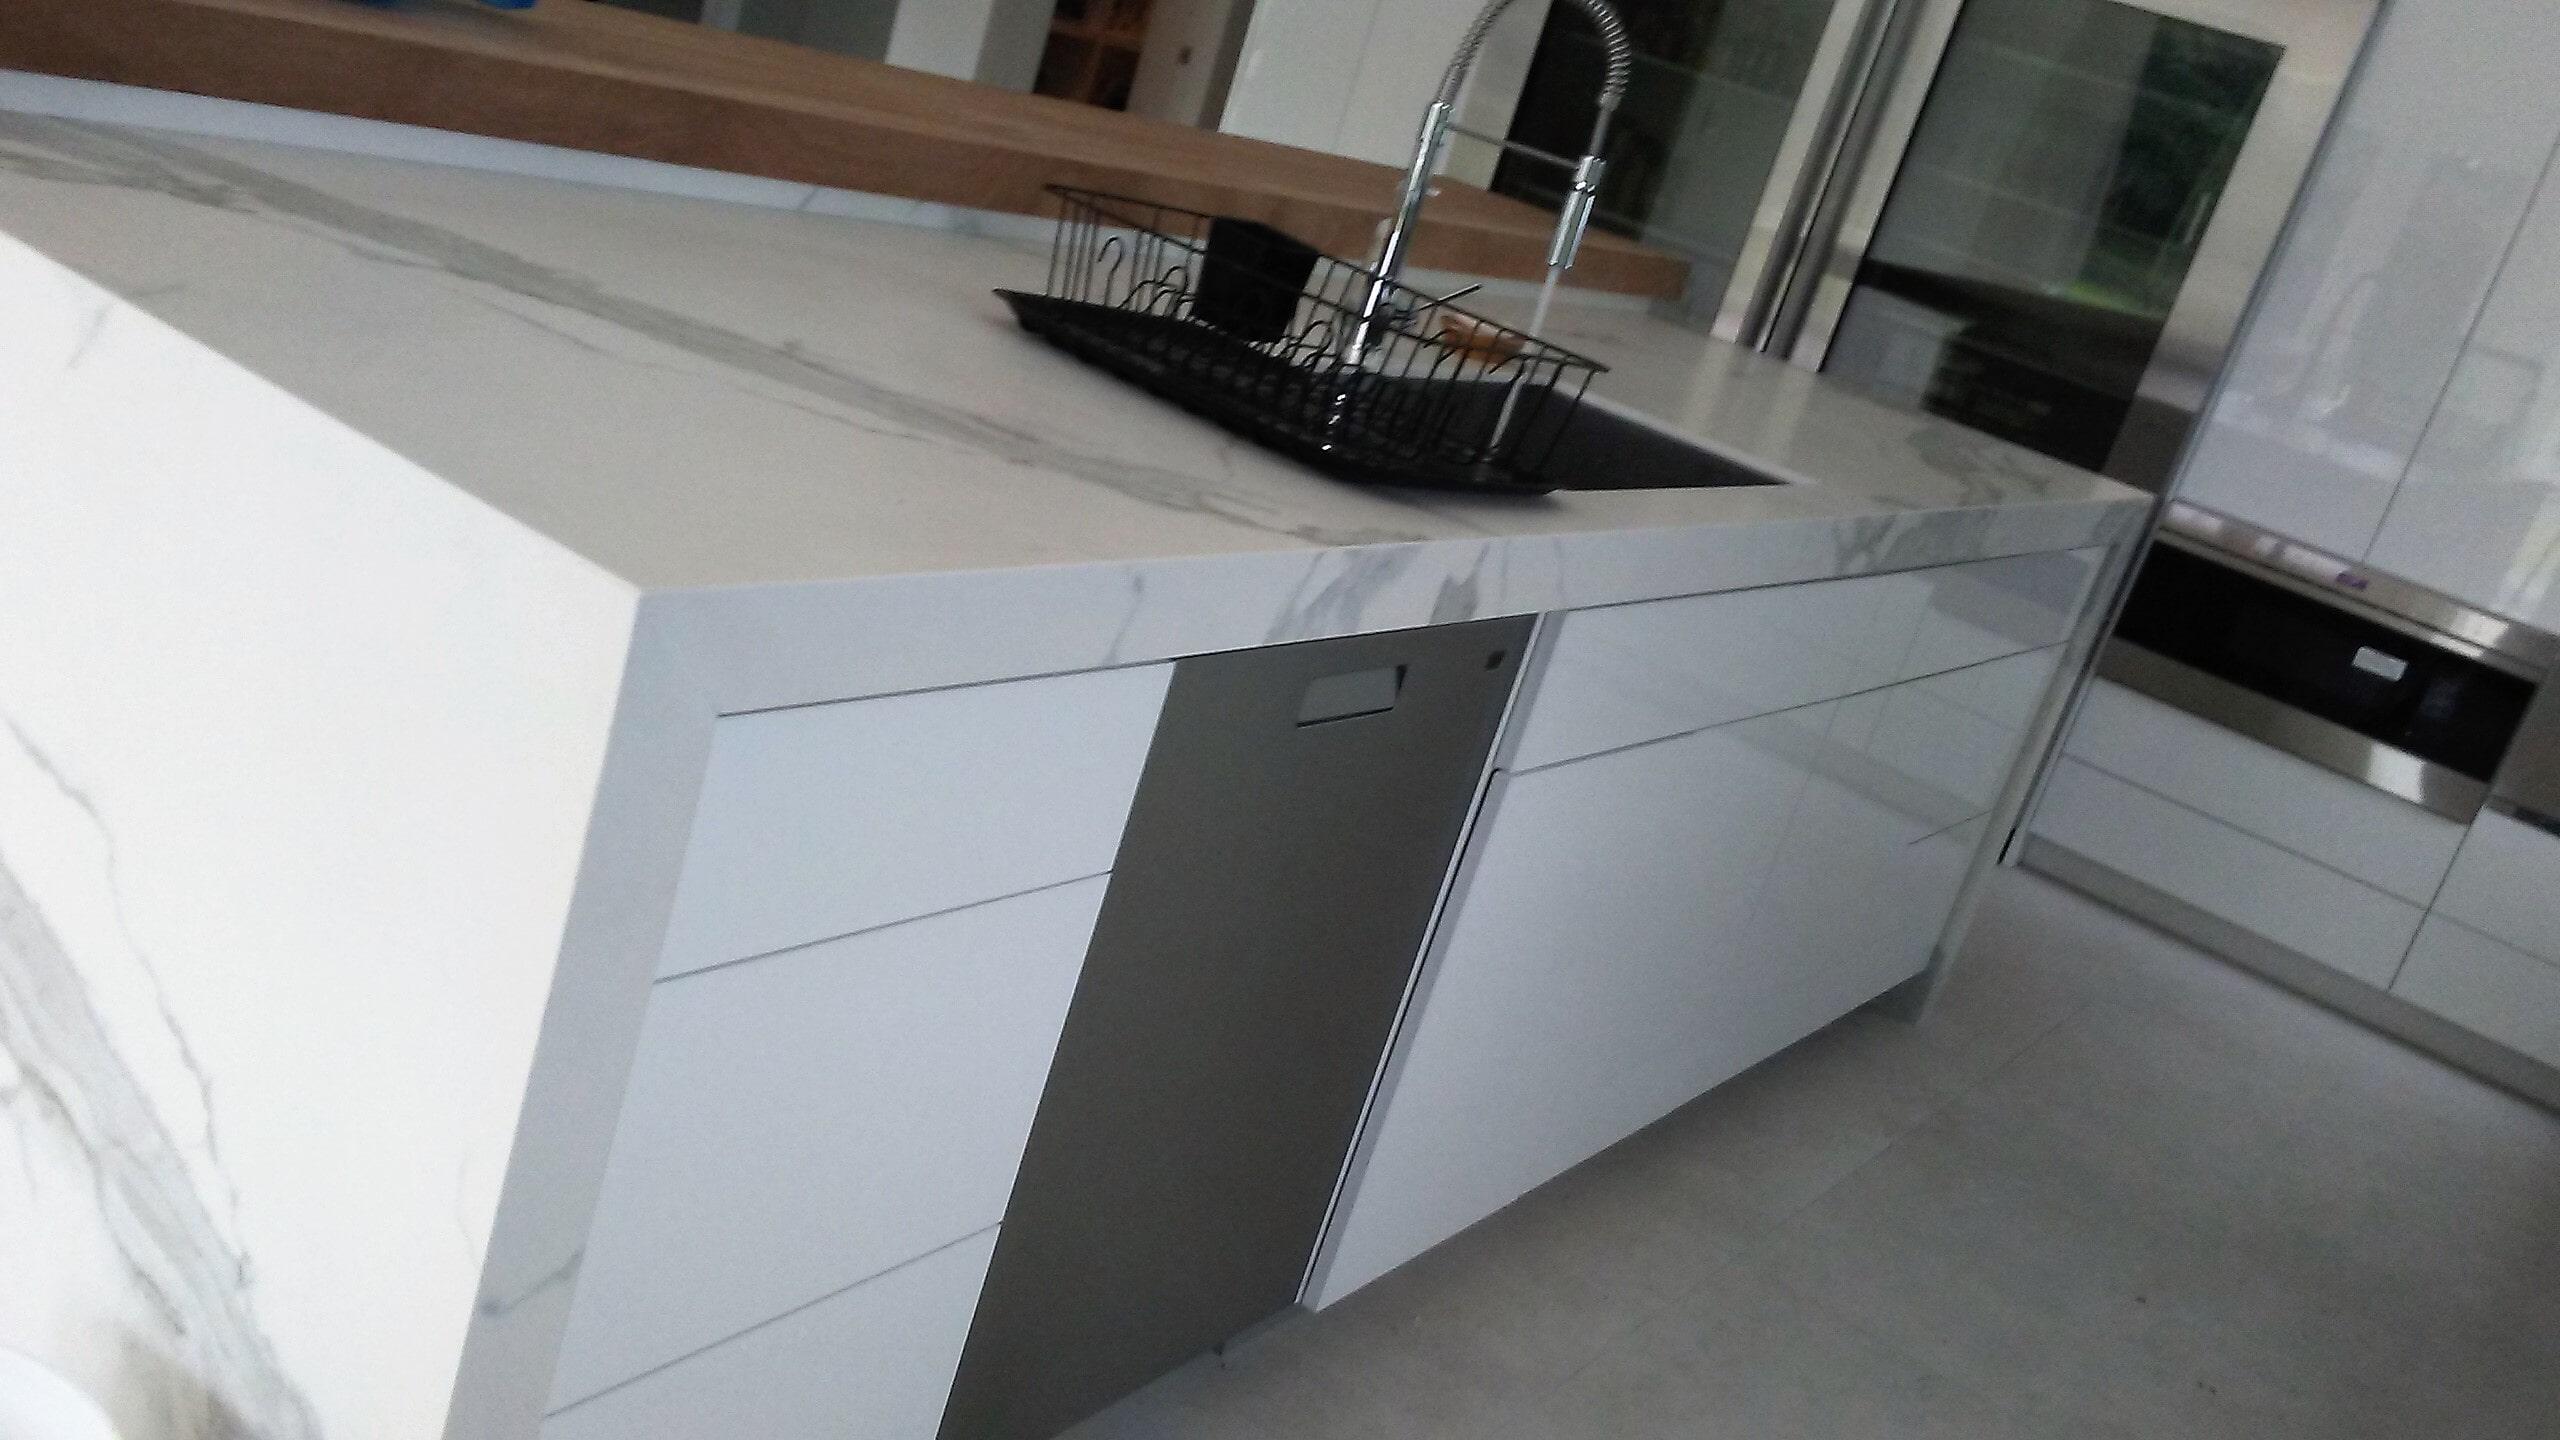 Genial Custom Countertops U2014 Granite Countertops In Pompano Beach, FL